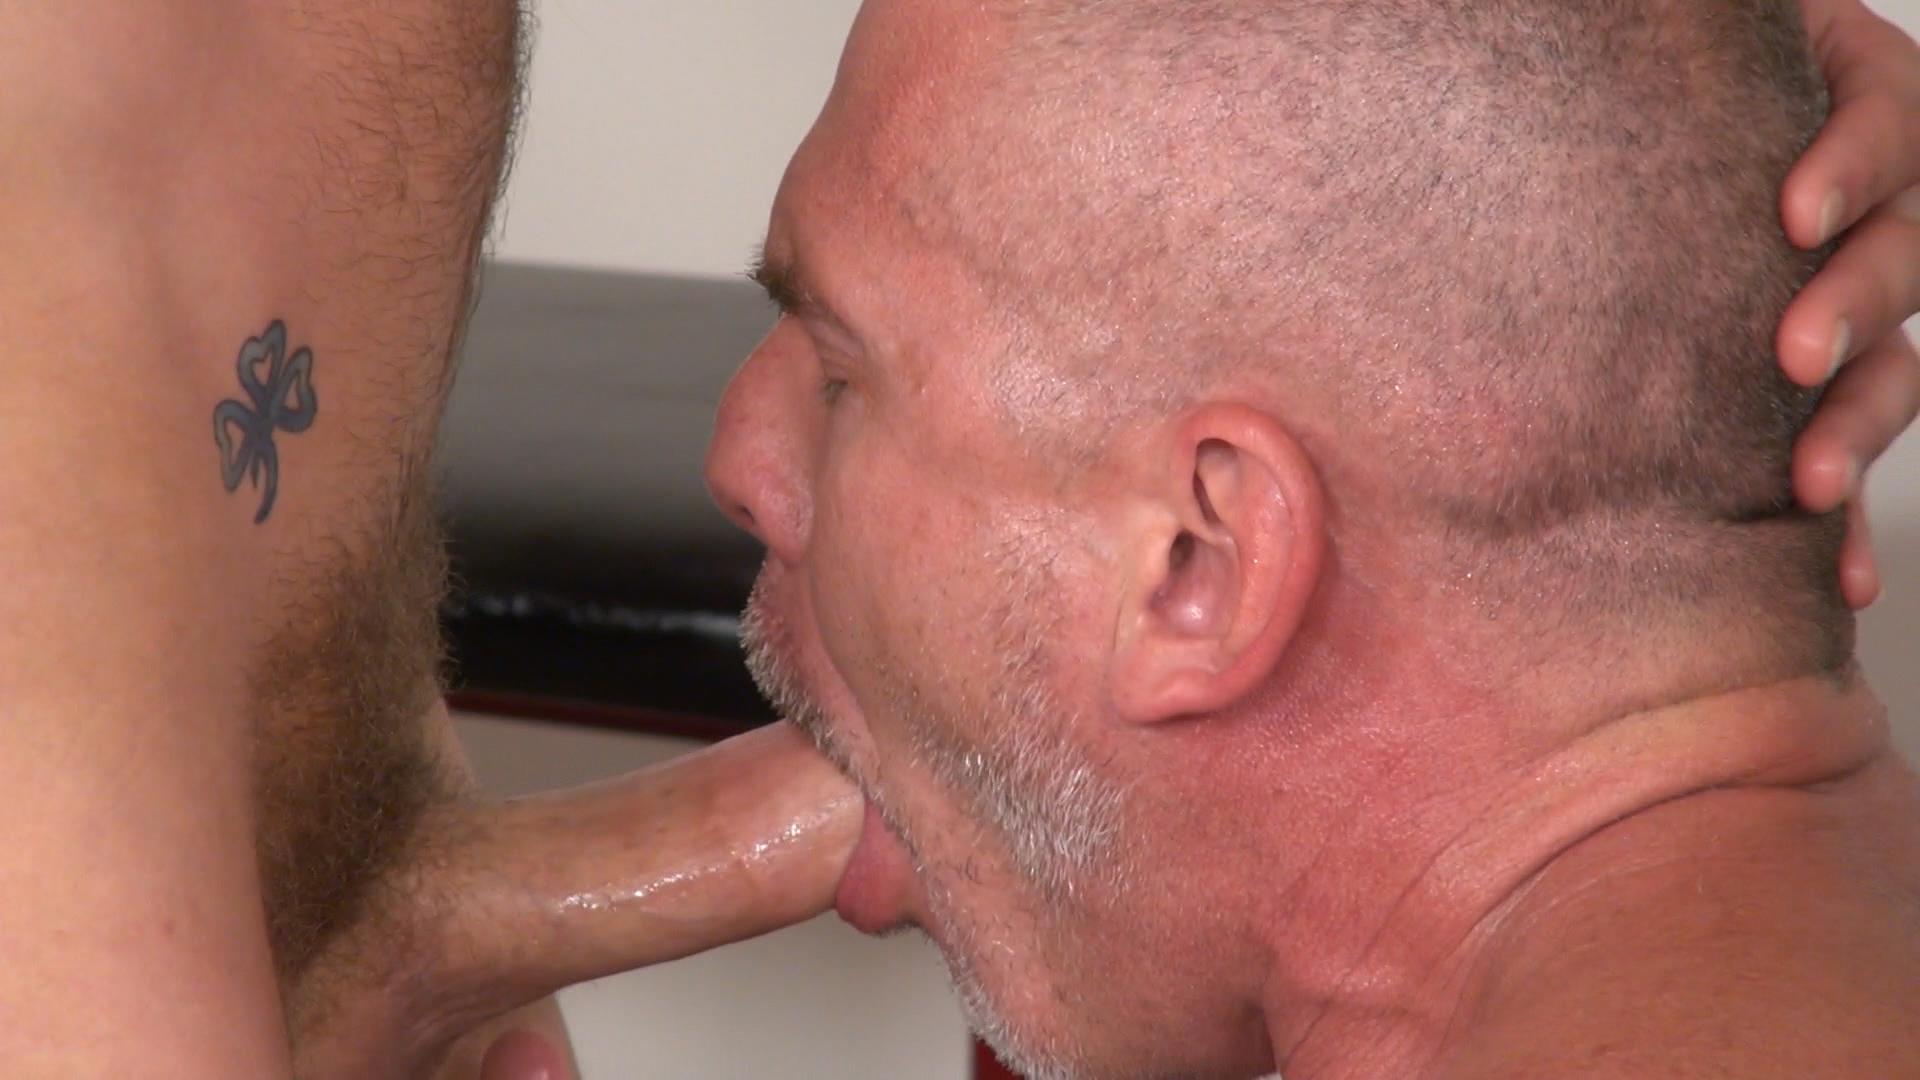 Raw and Rough Sam Dixon and Blue Bailey Daddy And Boy Flip Flip Bareback Fucking Amateur Gay Porn 01 Blue Bailey Flip Flop Barebacking With A Hung Daddy